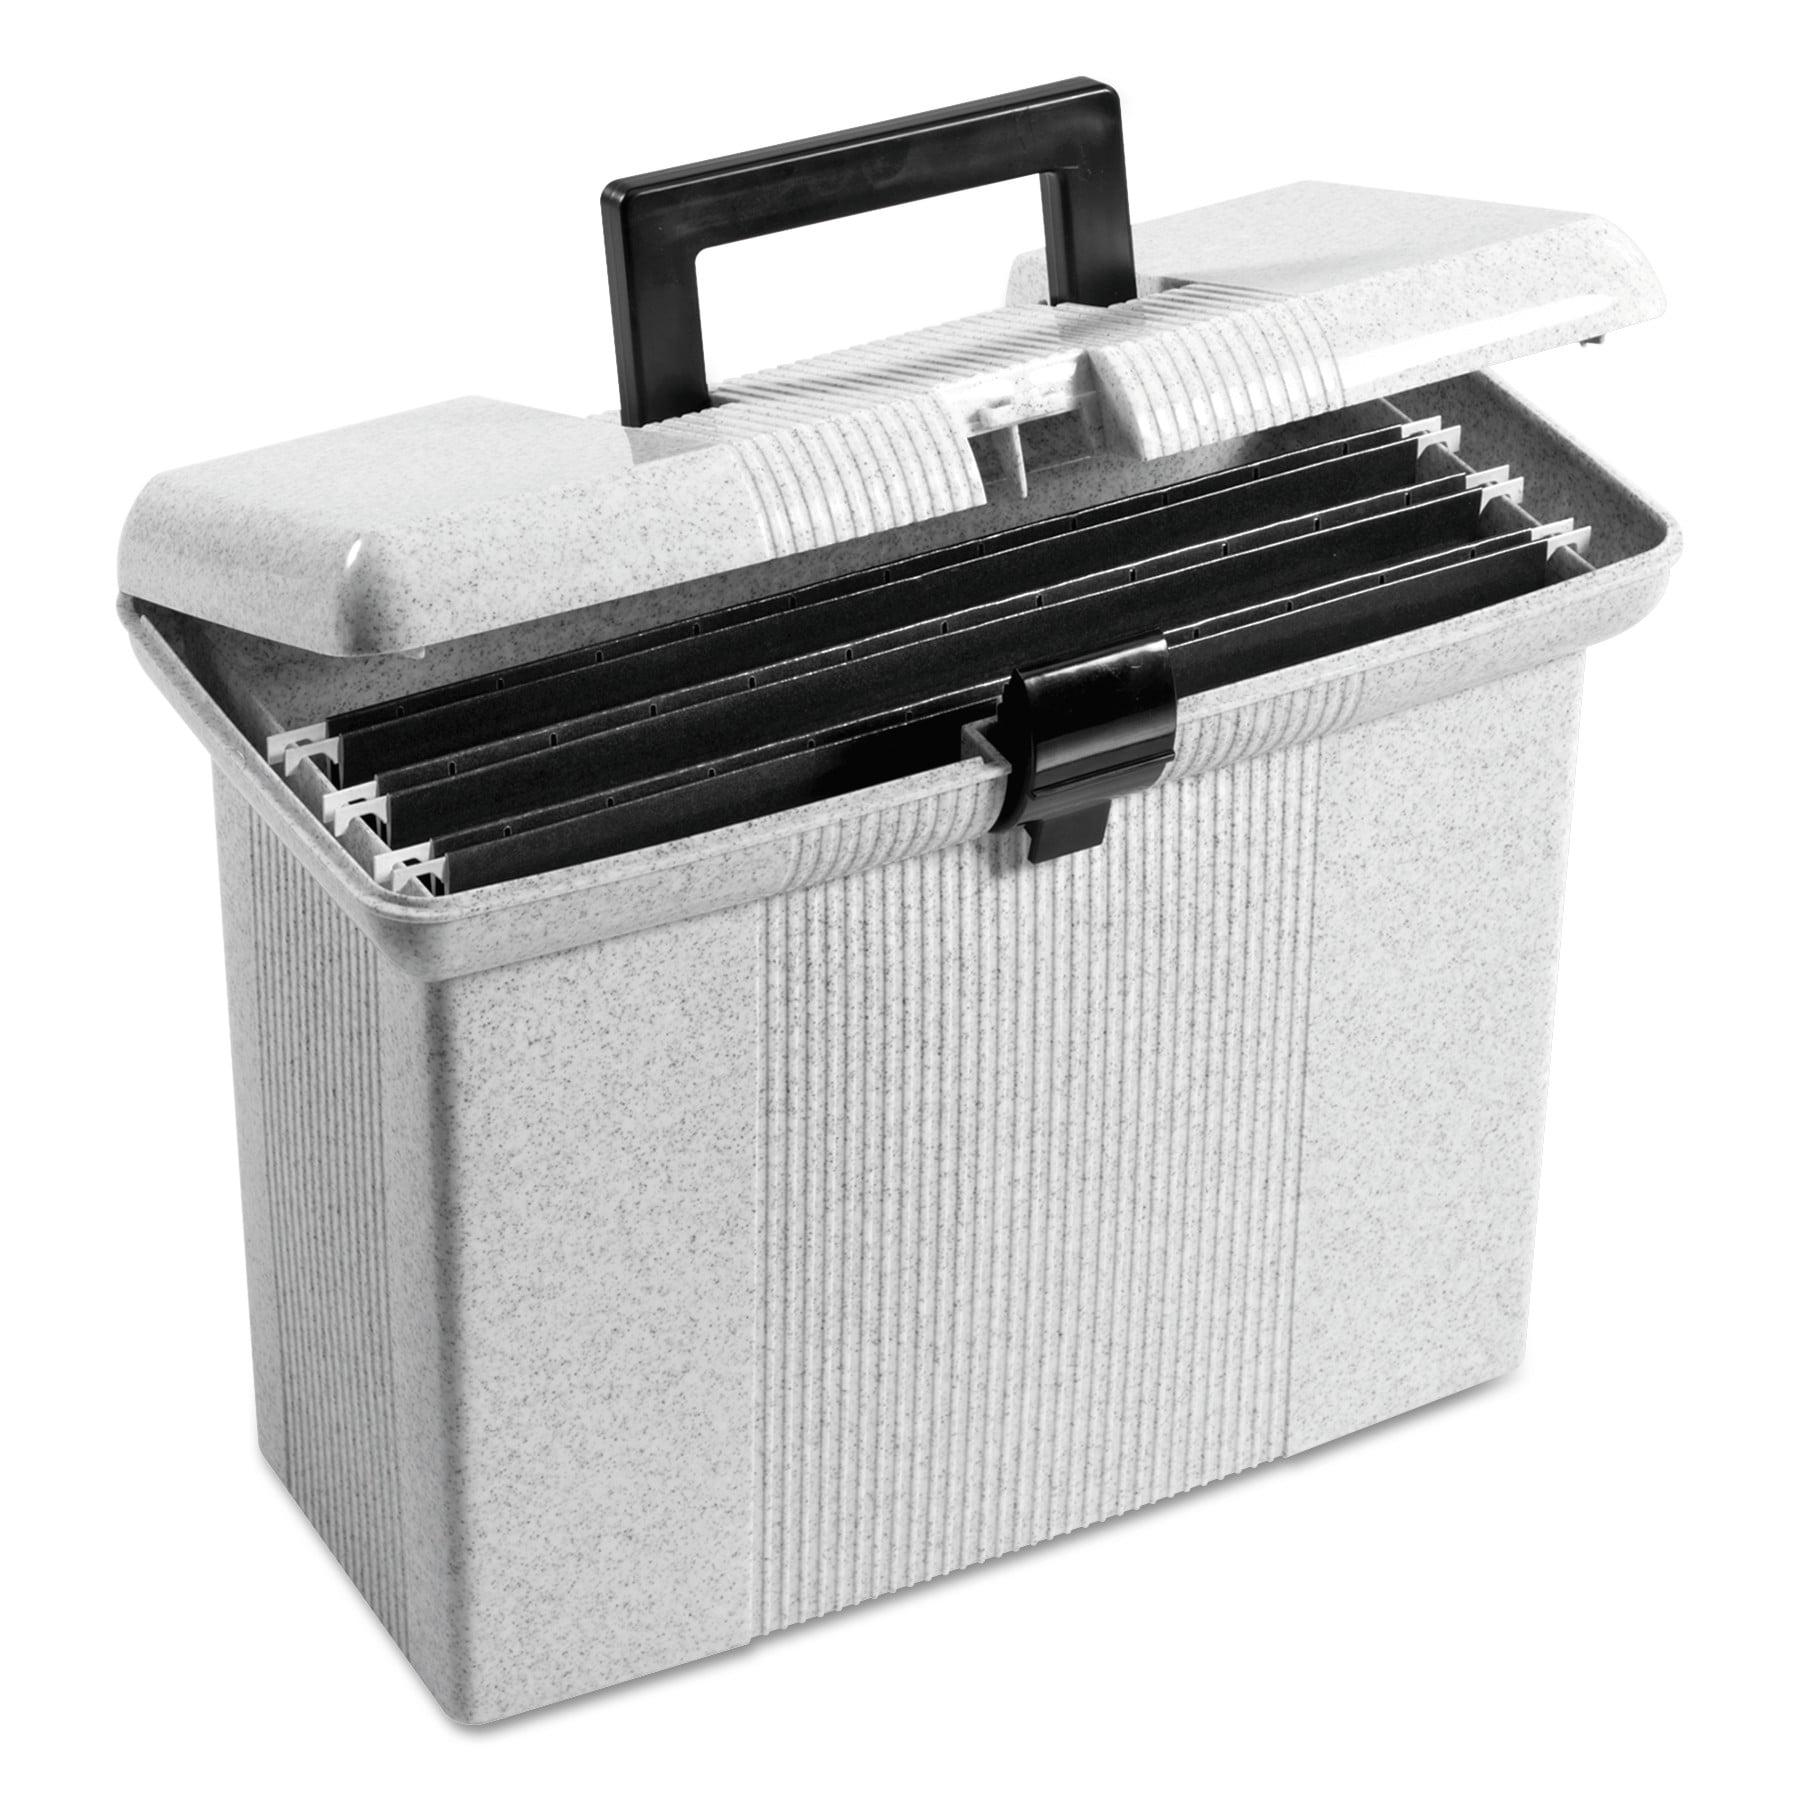 Pendaflex Portable File Boxes, Letter, Plastic, 14-7/8 x 6-1/2 x 11-7/8, Granite -PFX41737